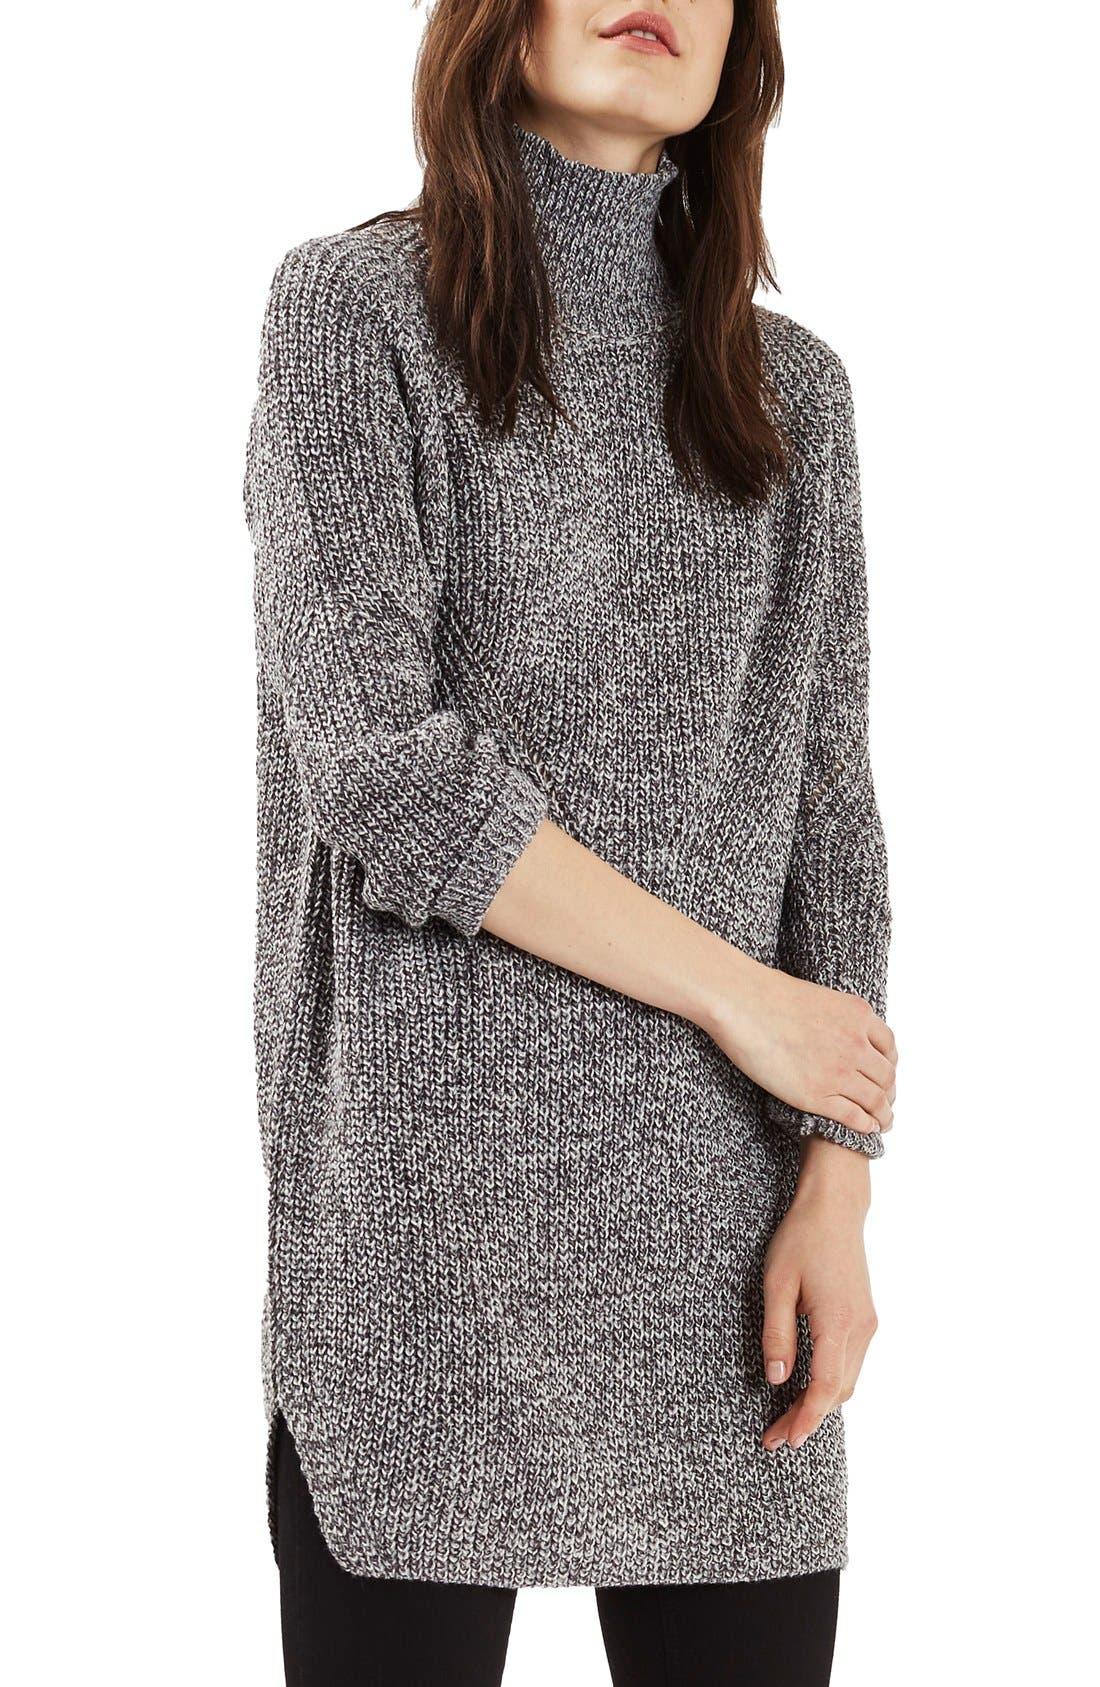 Alternate Image 1 Selected - Topshop Grunge Funnel Neck Sweater Dress